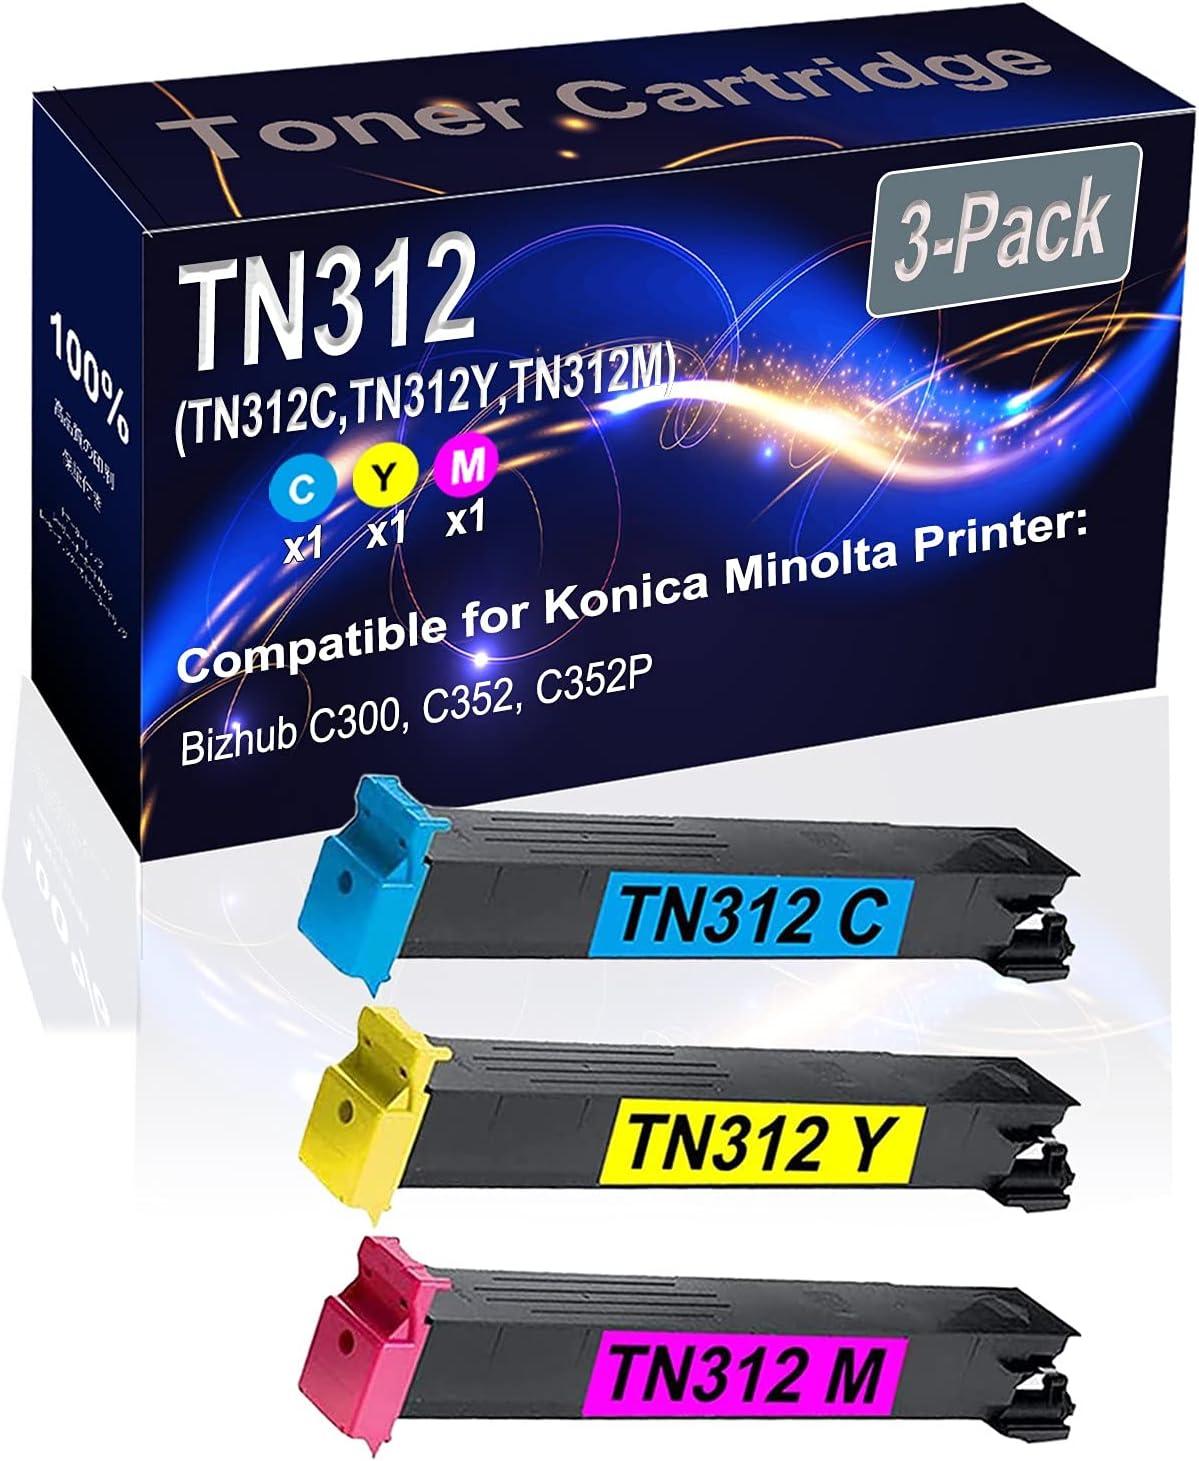 3-Pack (C+Y+M) Compatible High Yield TN312 (TN312C TN312Y TN312M) Printer Toner Cartridge use for Konica Minolta Bizhub C300 C352 C352P Printers